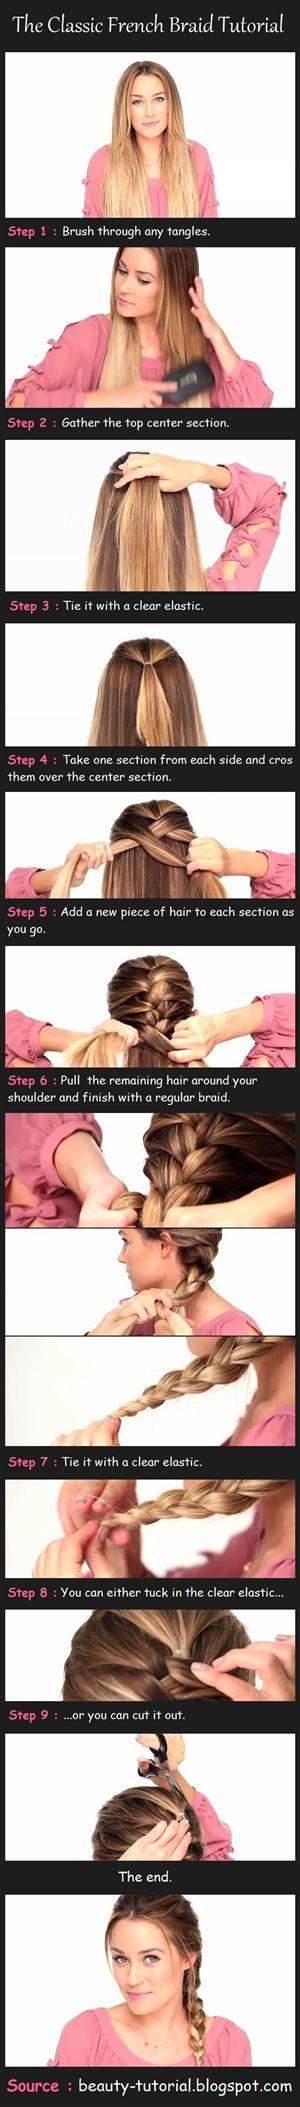 Best 25+ Braid hair ideas on Pinterest | French braid ...